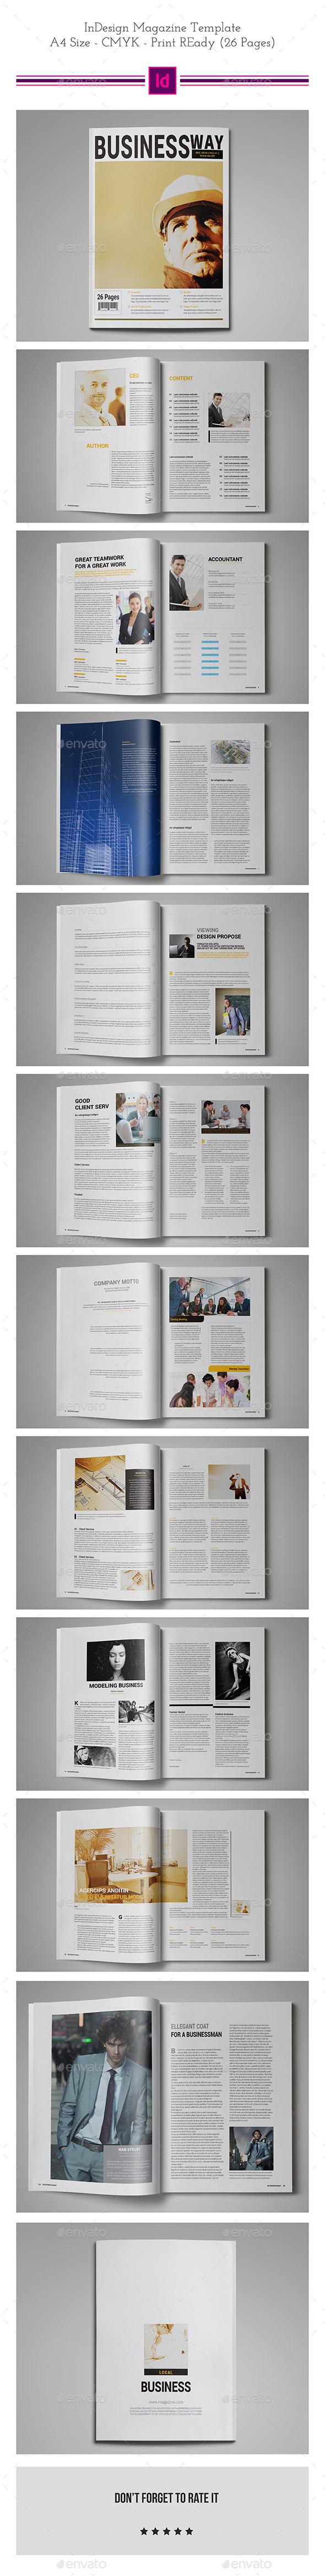 GraphicRiver Business Magazine Template 8990049